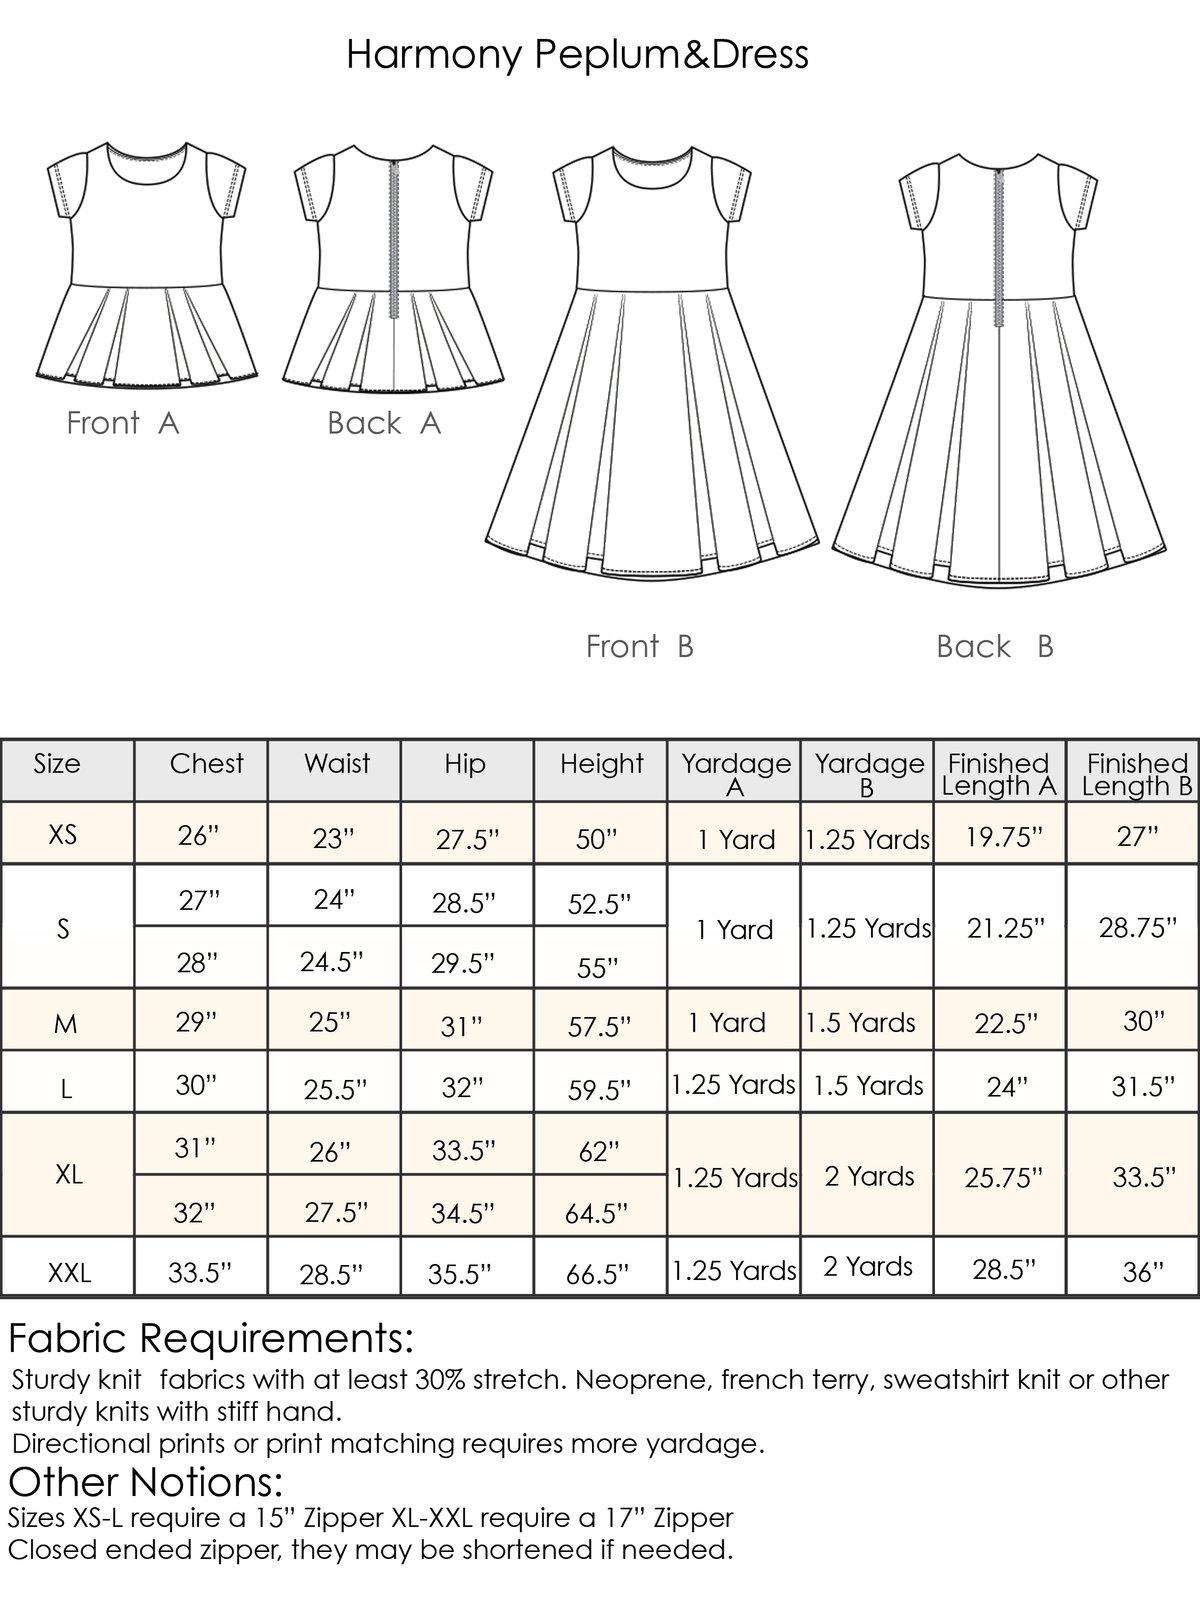 Image of Harmony Peplum&Dress